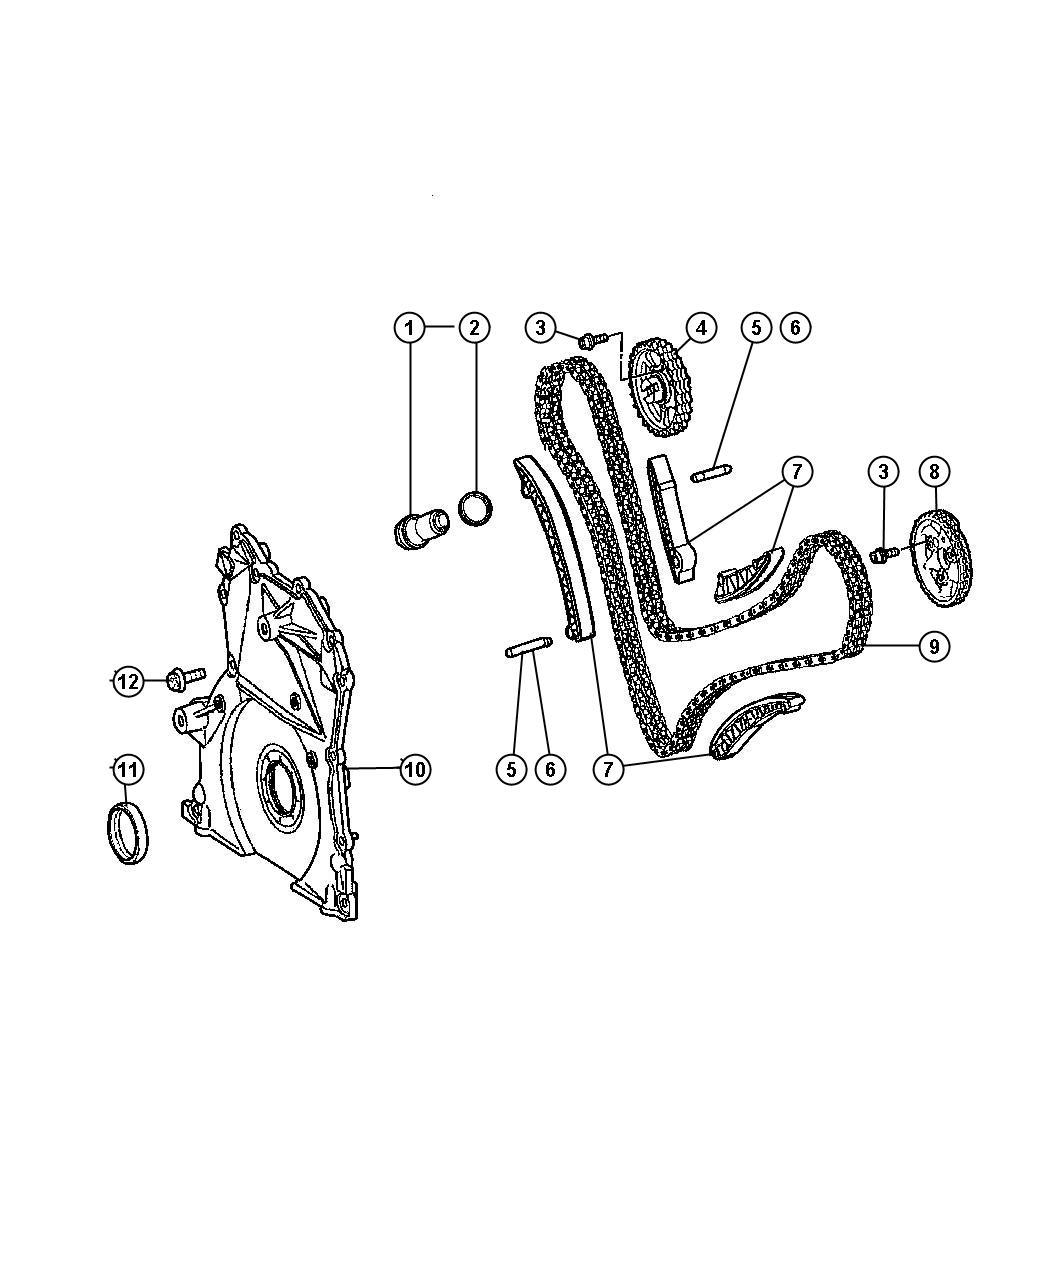 Dodge Sprinter Dowel Pin Pin Sliding Rail To